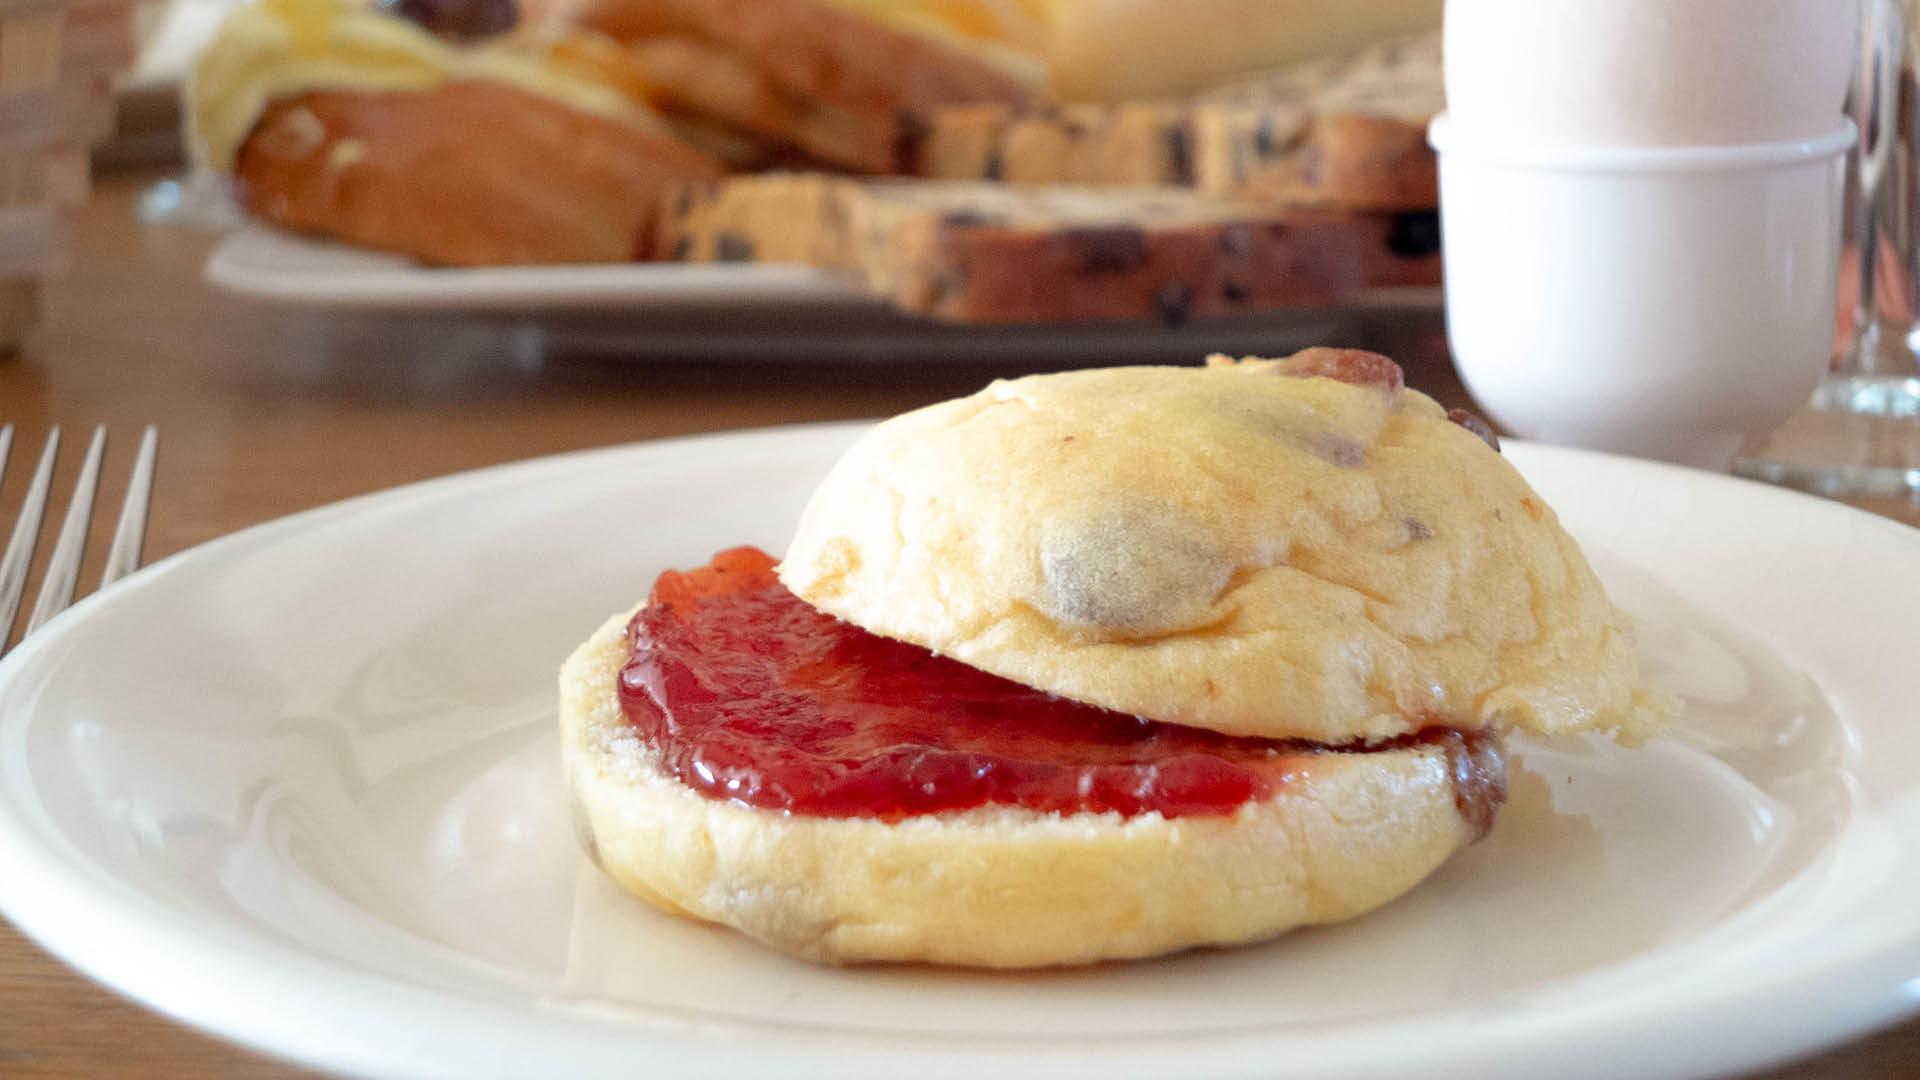 Slider ontbijtservice8